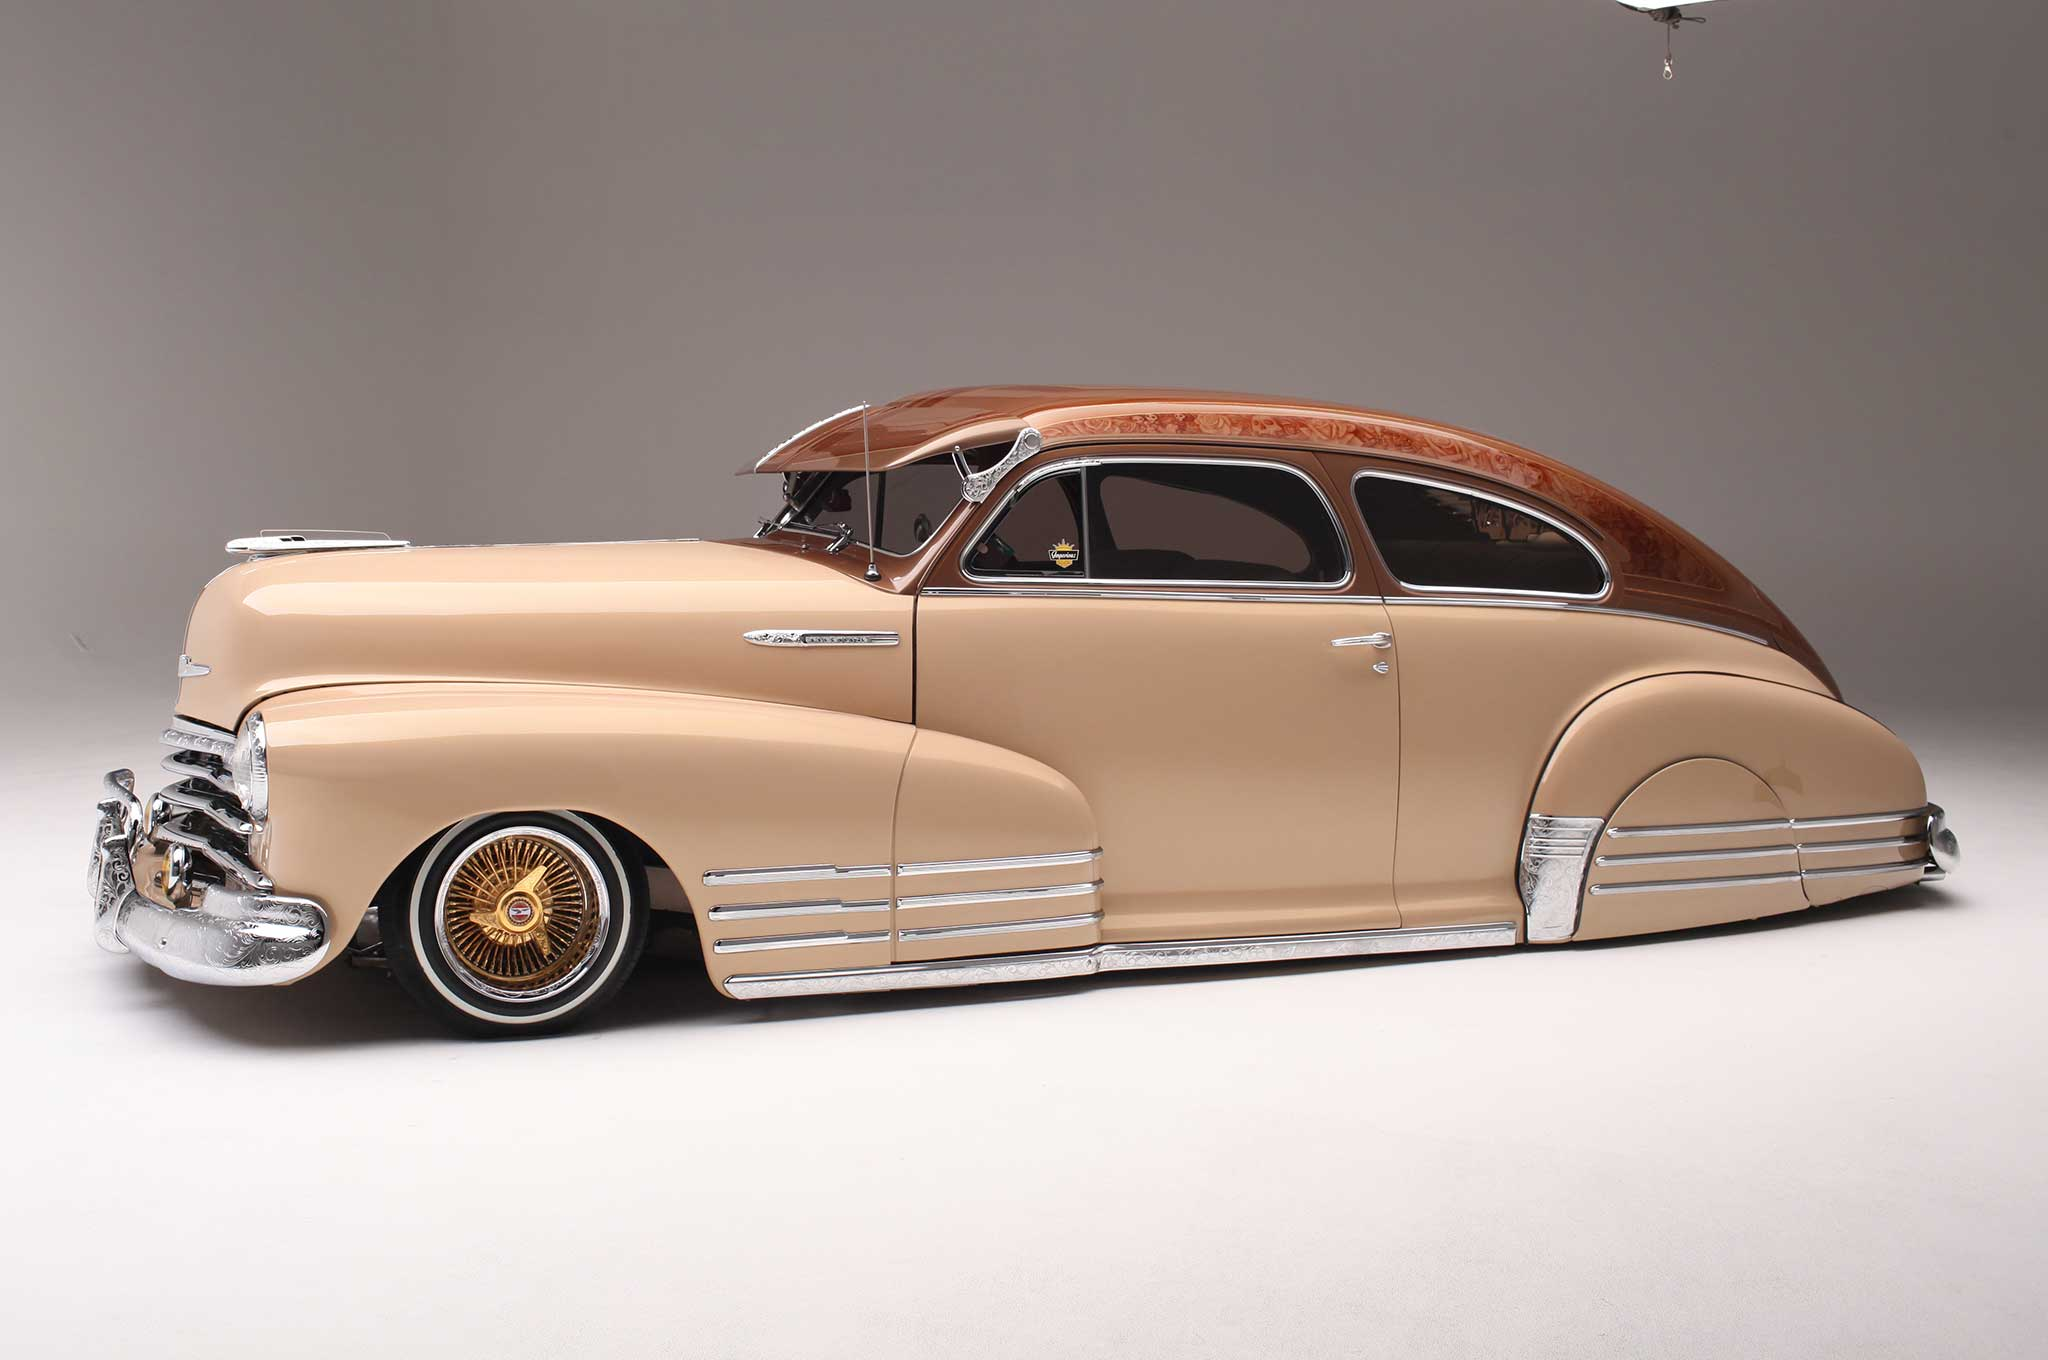 1947 Chevrolet Fleetline Top Of The Line Lowrider